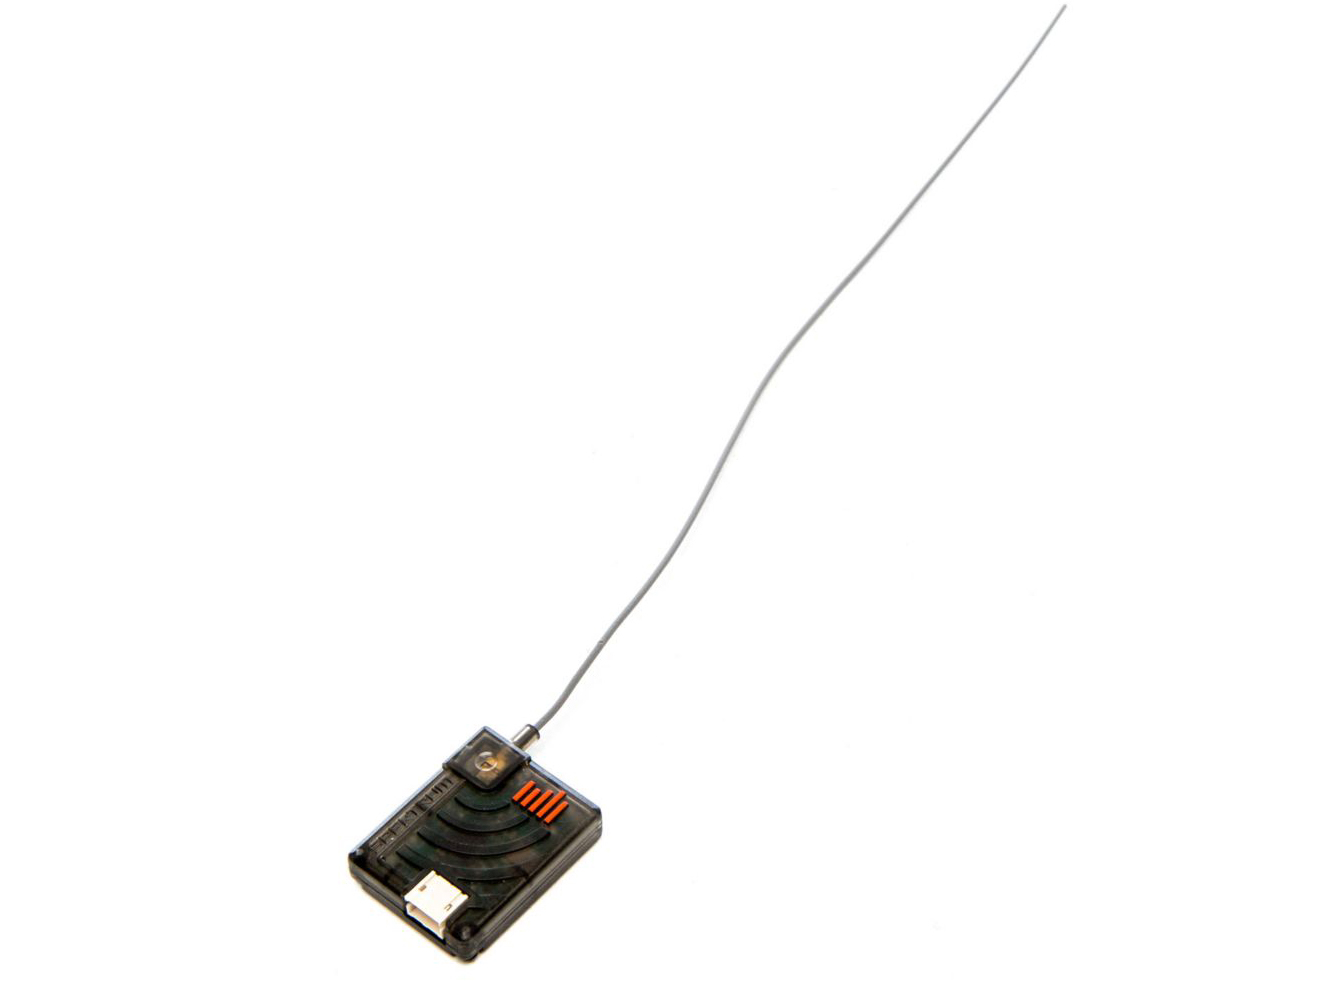 DSMX Carbon Fiber Remote Receiver